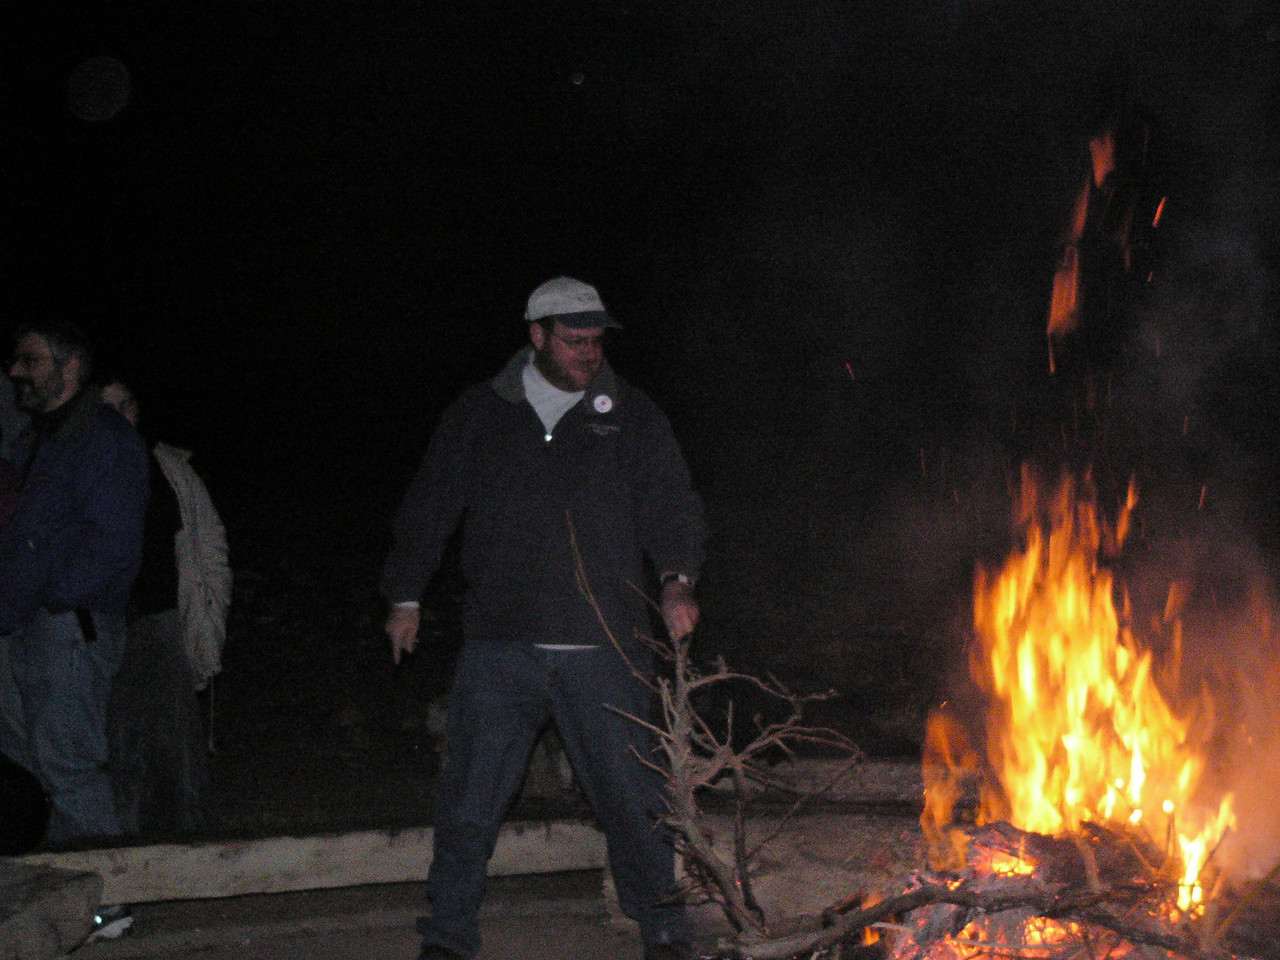 Rabbi Stokes the Fire